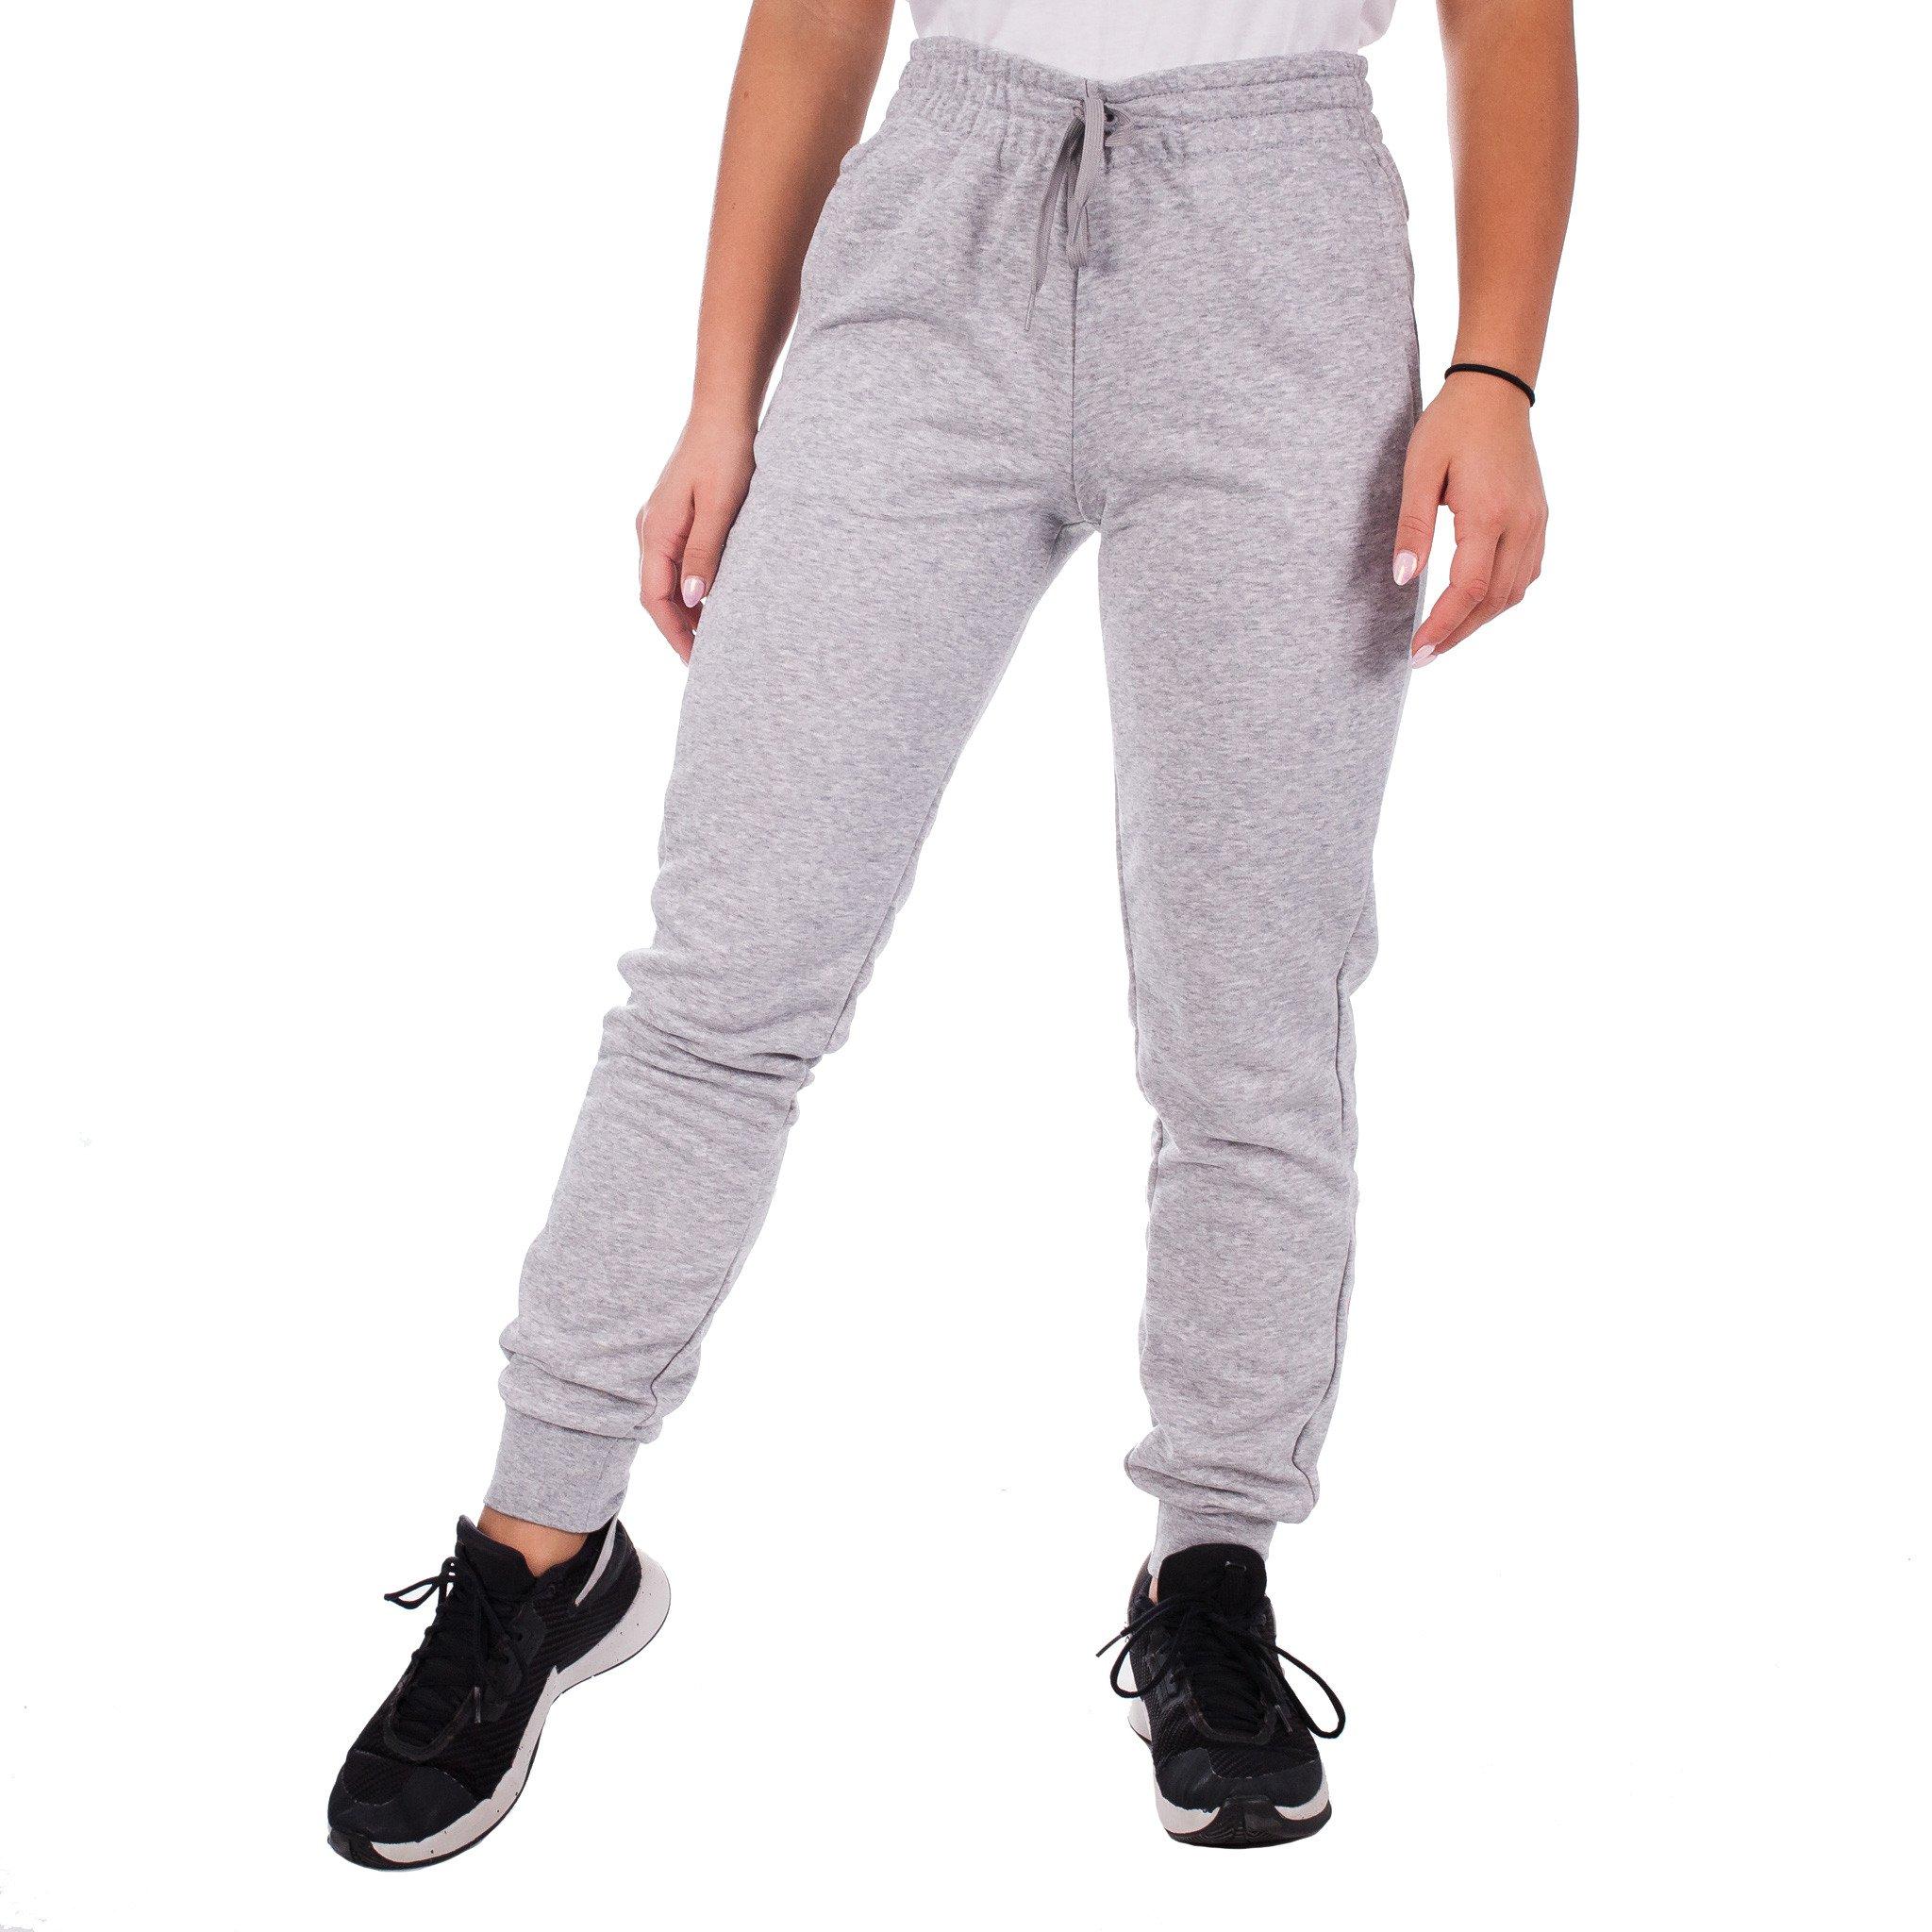 Spodnie damskie adidas W E Lin Pant szare EI0658 Rozmiar M